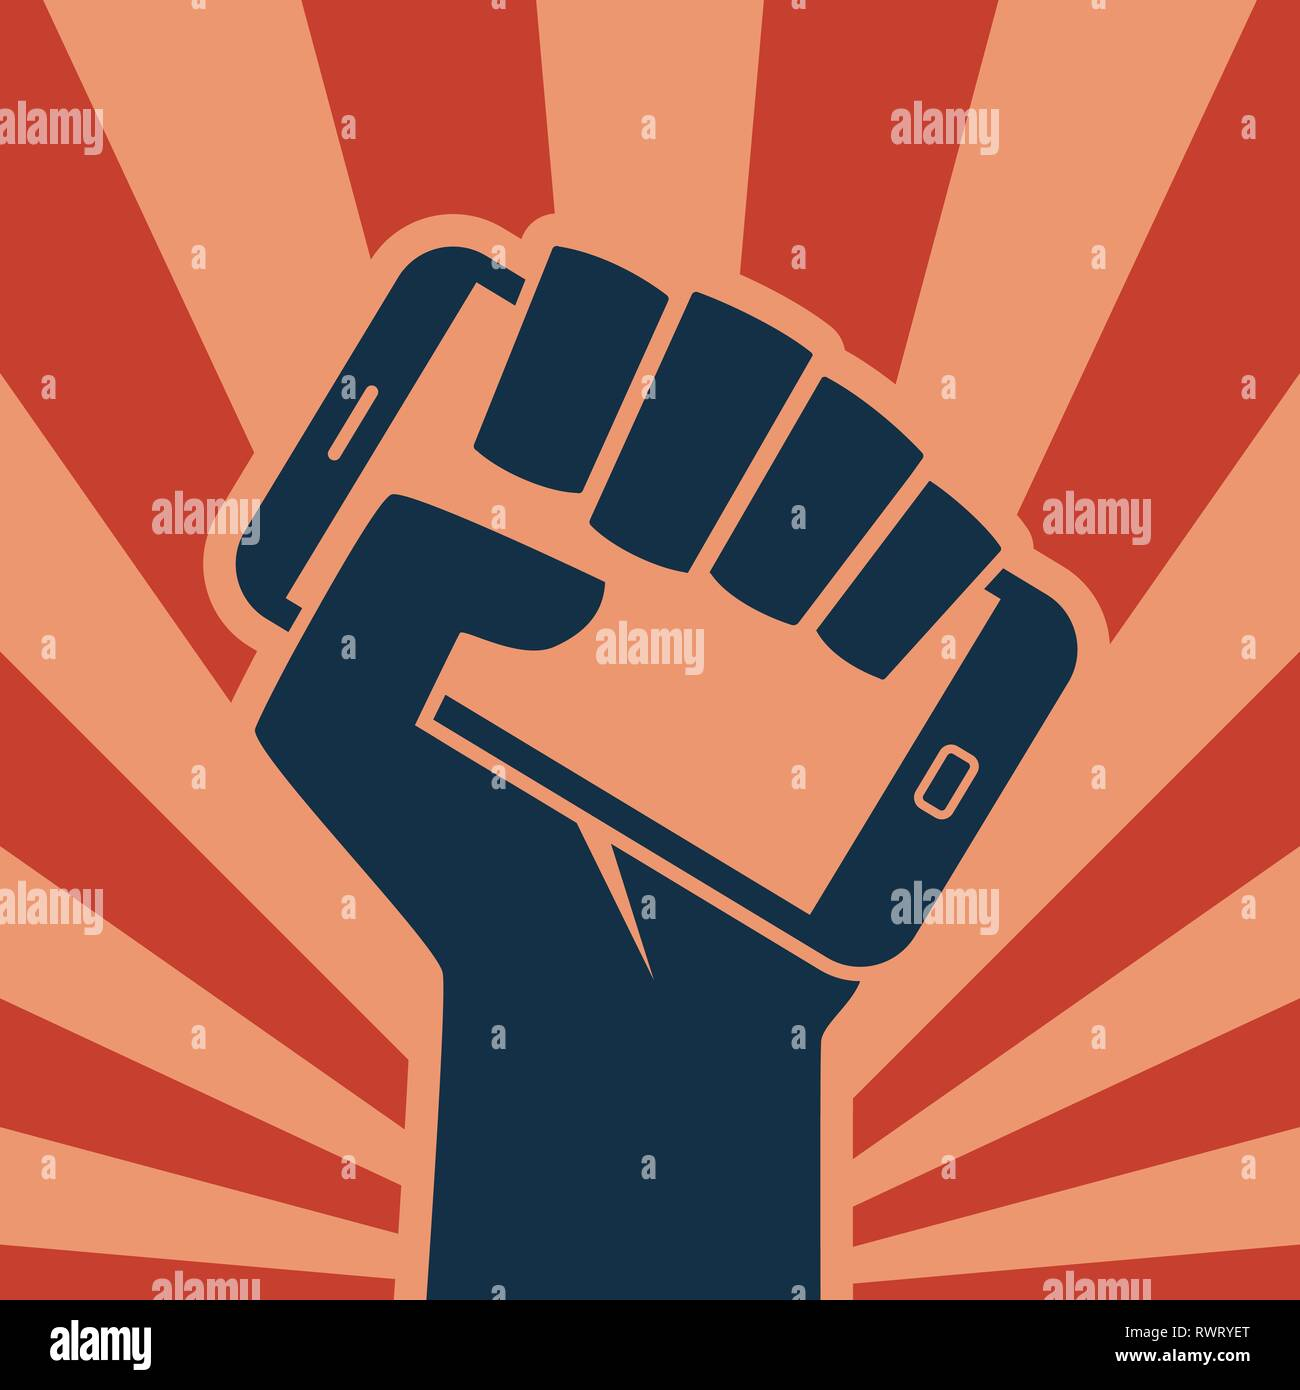 Hand holding smartphone like call to digital revolution retro style icon Stock Vector